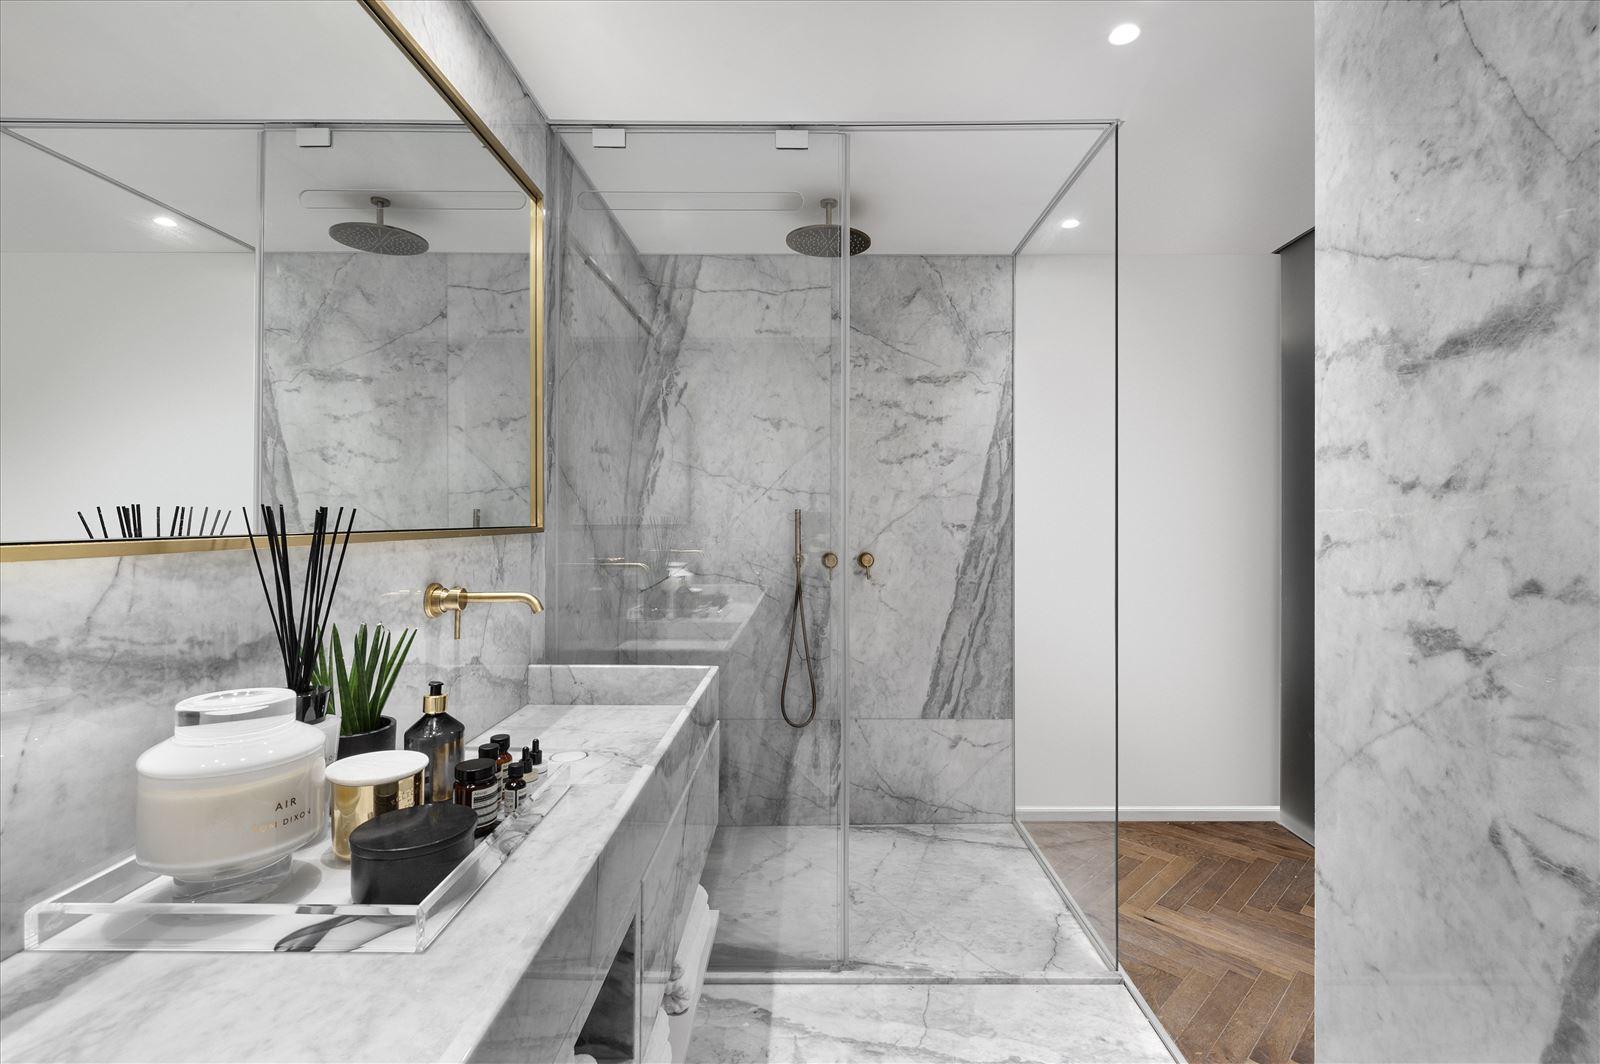 Duplex lighting - תאורה באמבטיה על ידי דורי קמחי